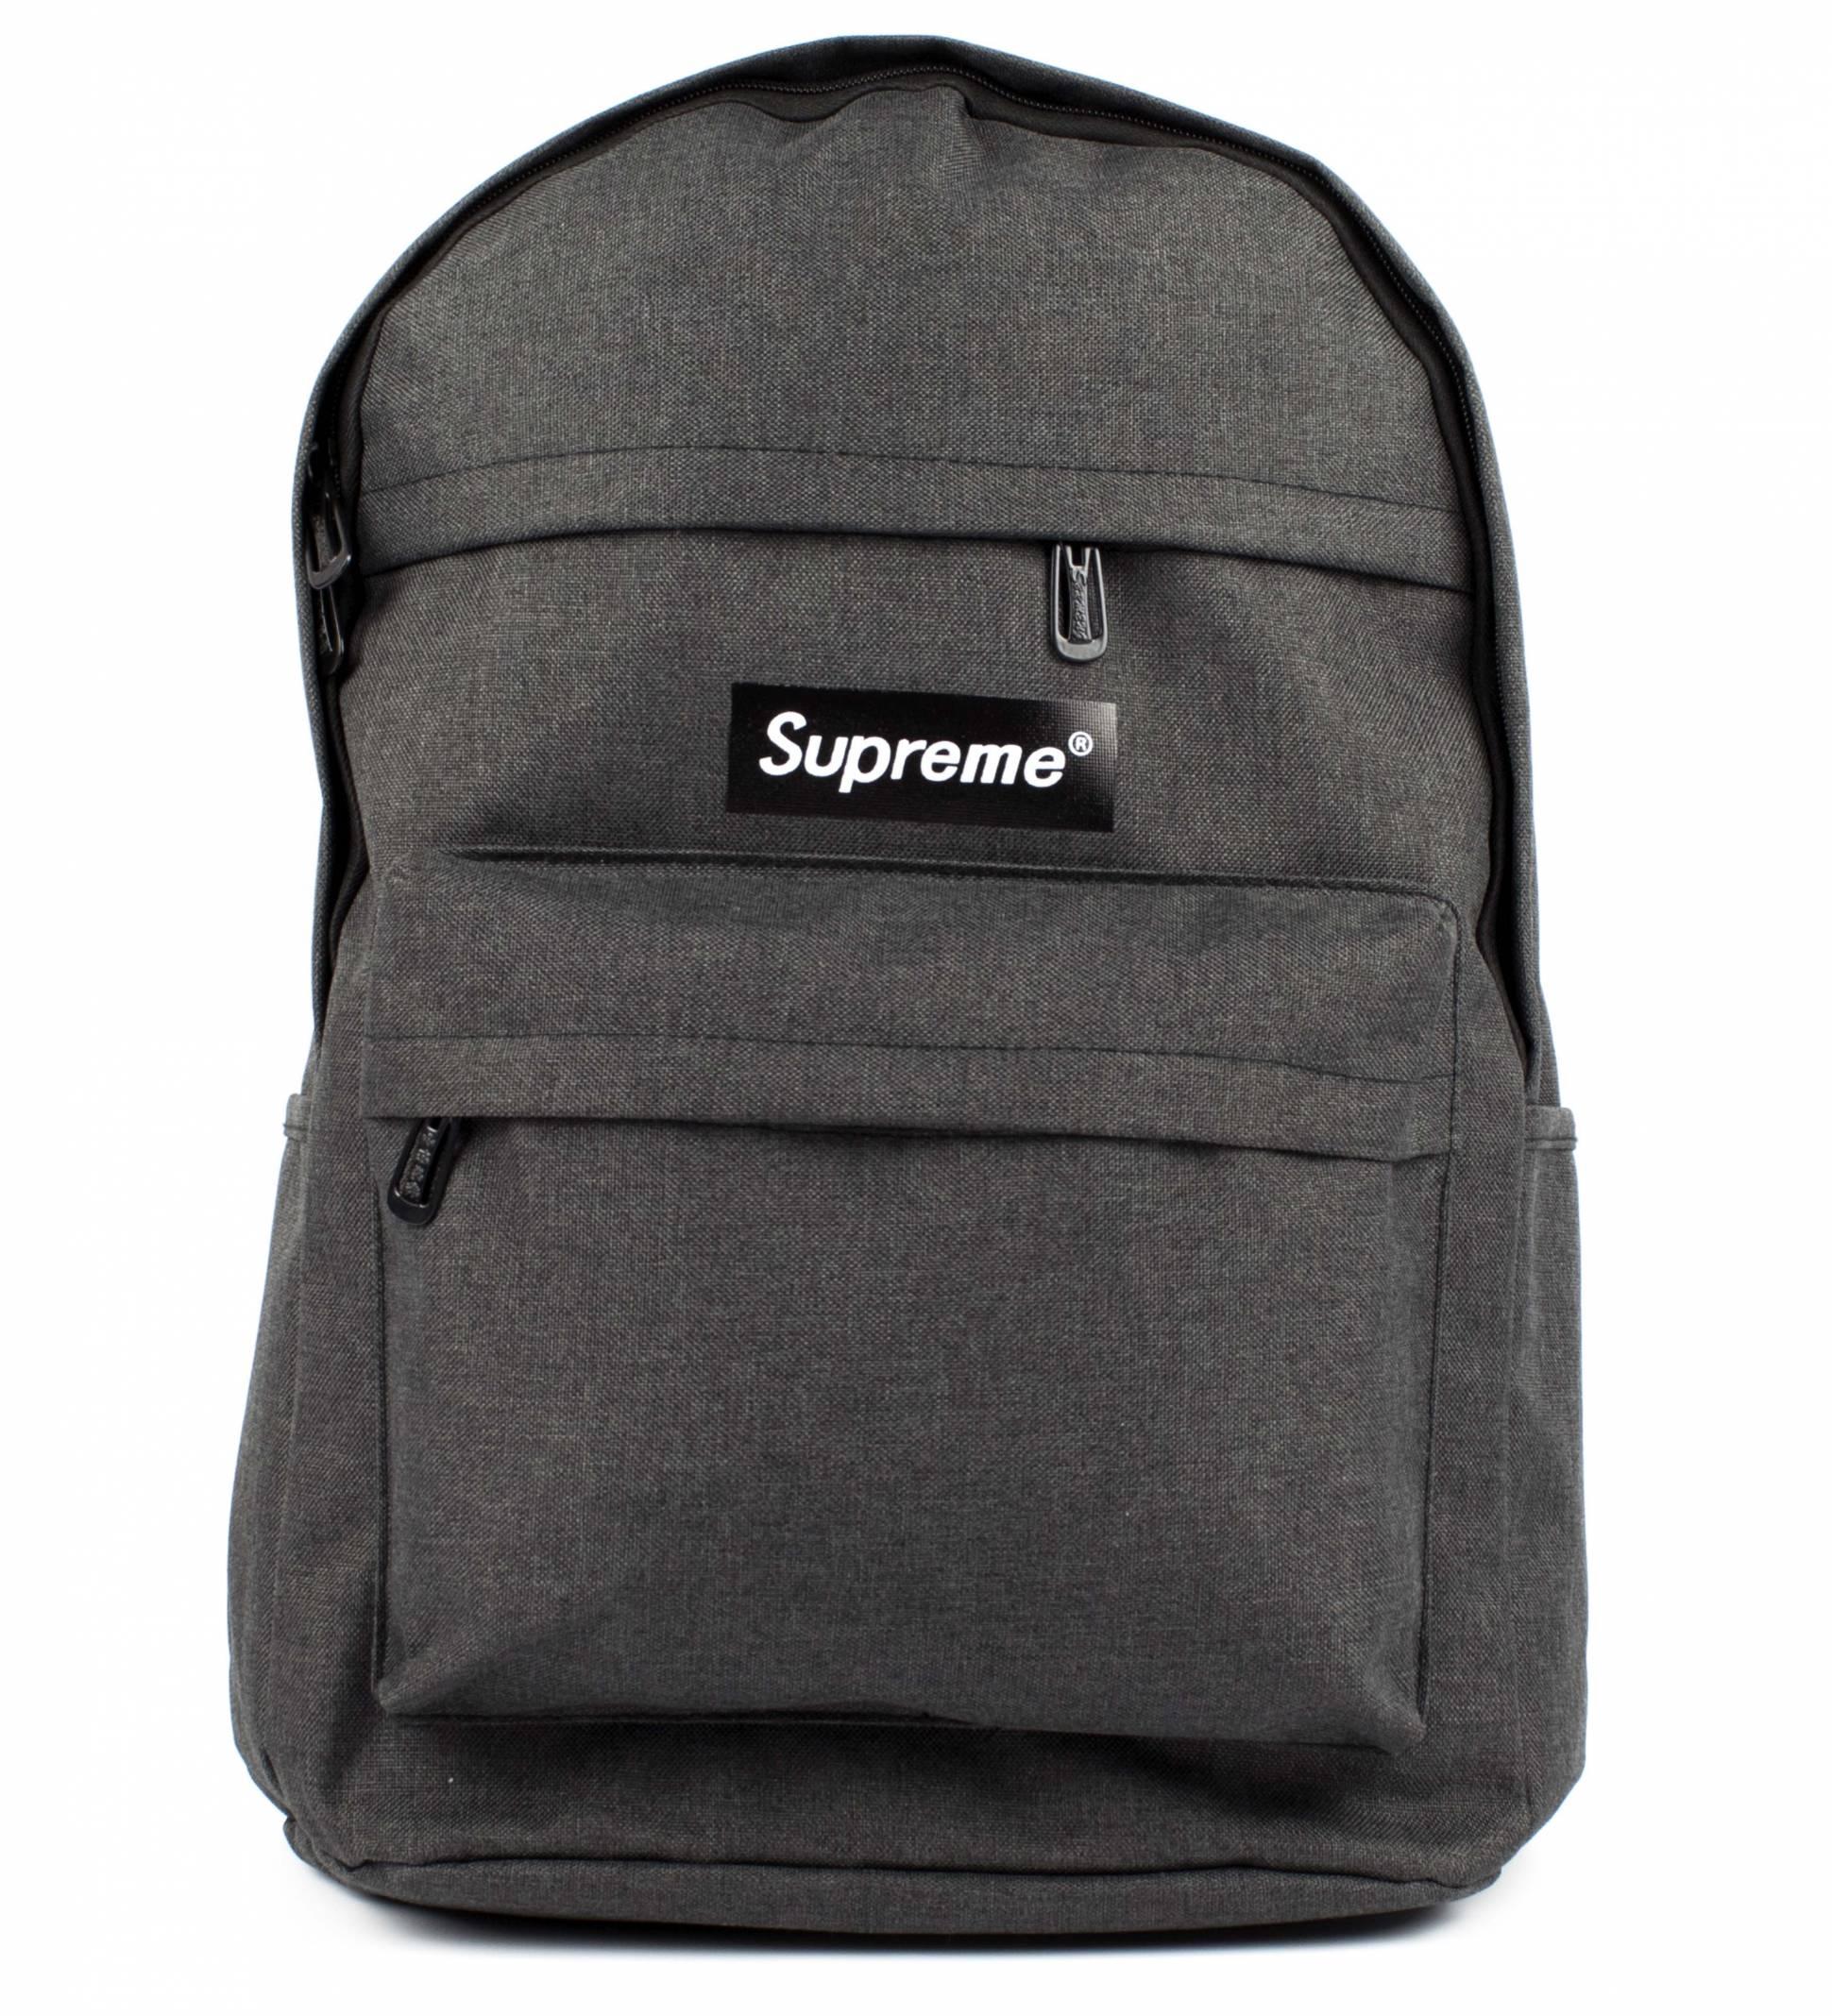 3e555f25d710 Рюкзак Supreme S541 темно-серый купить по цене 1 690 руб. в интернет ...